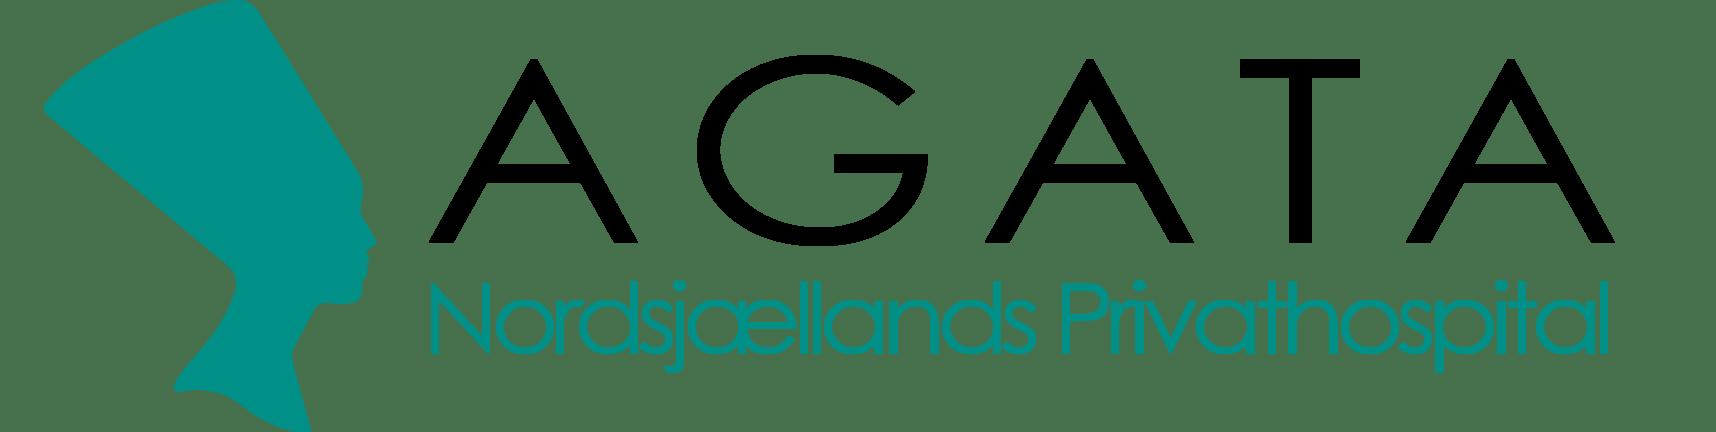 AGATA - Nordsjællands Privathospital